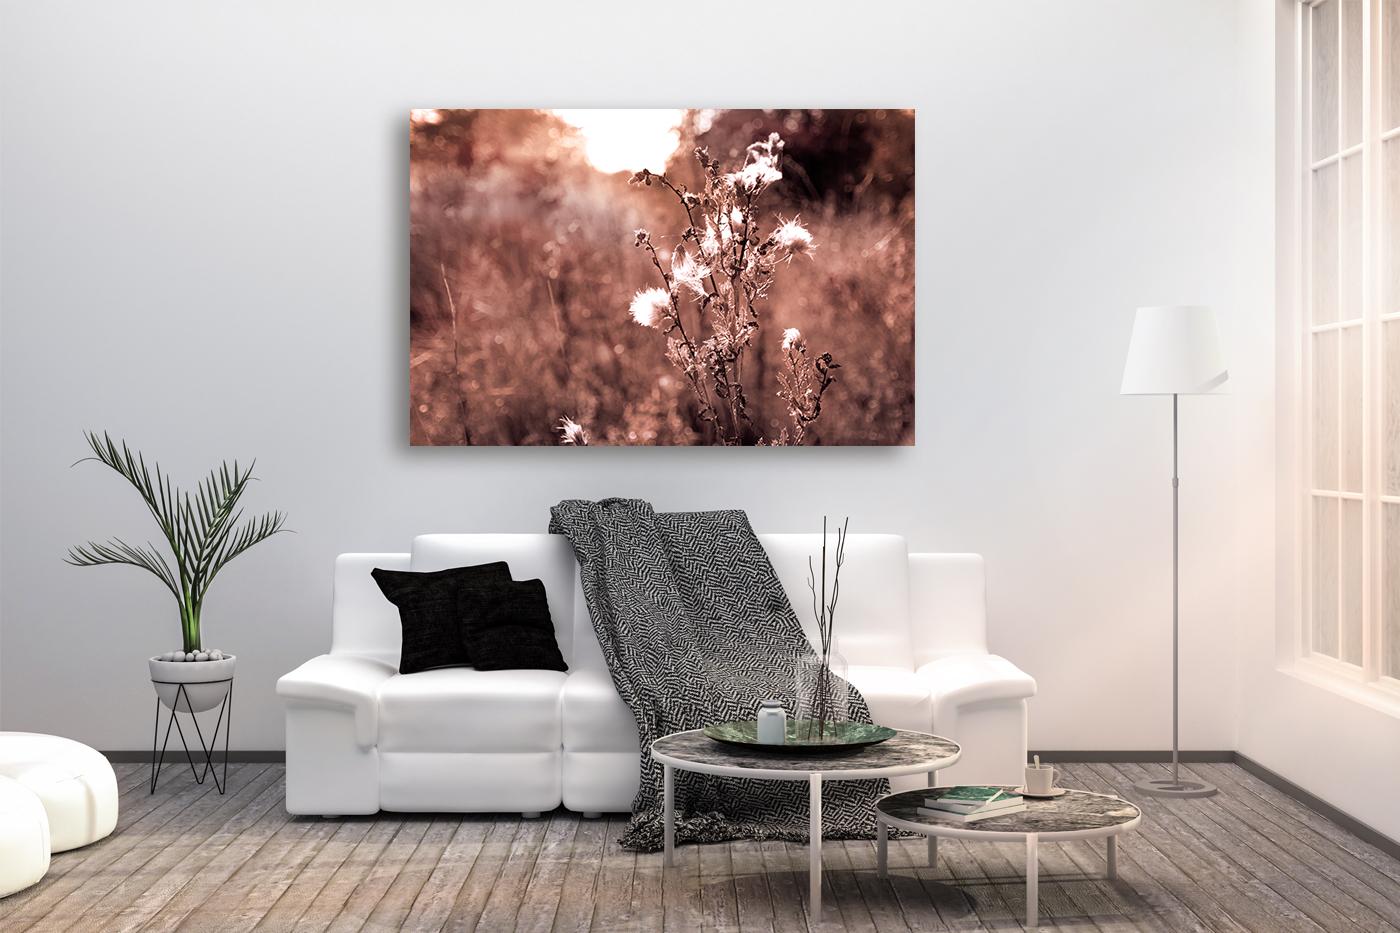 Nature photo, landscape photo, floral photo, flora photo example image 2